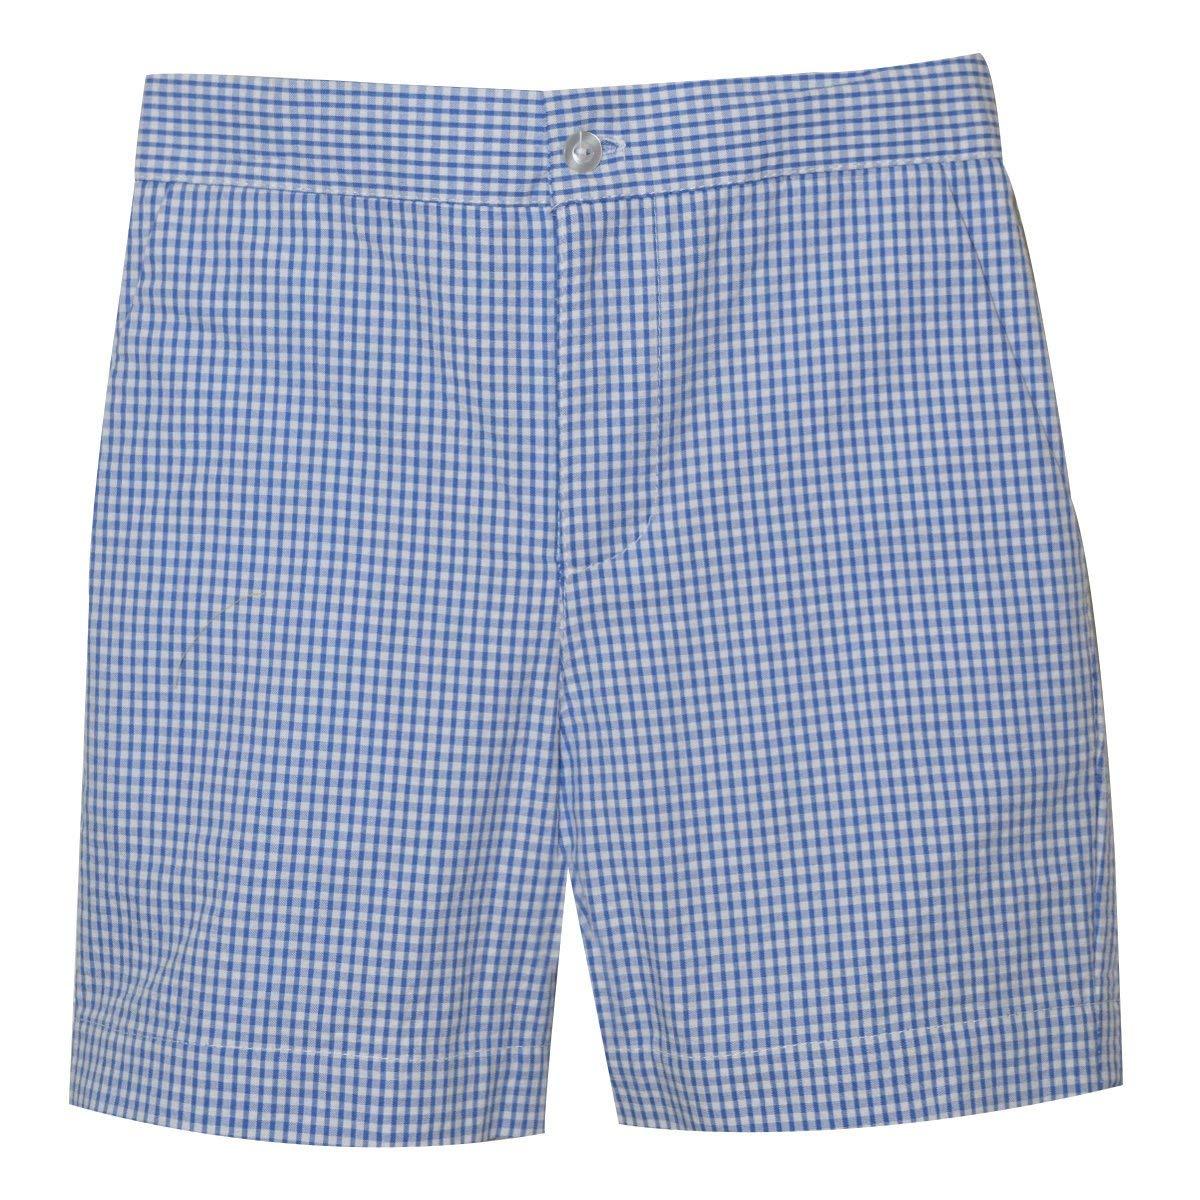 Betti Terrell Blue Check Seersucker Boys Zip Fly Short